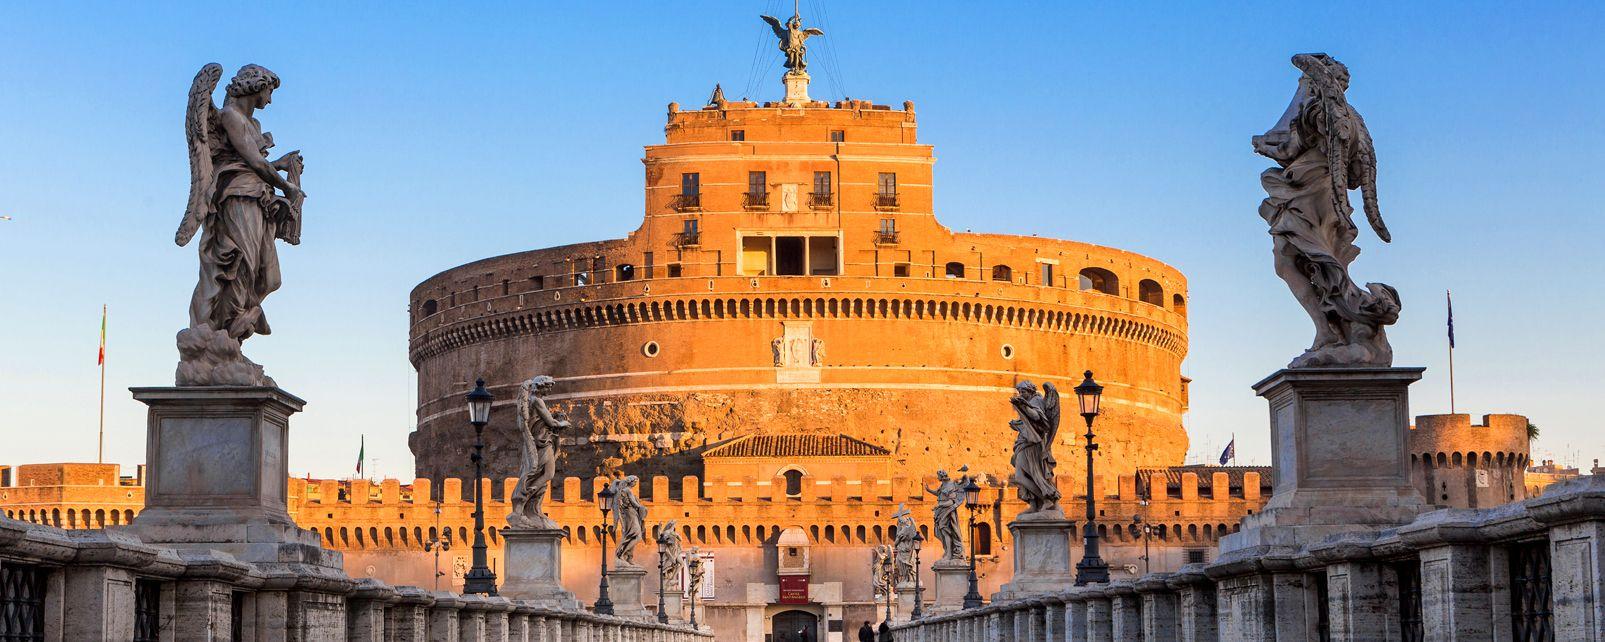 Castel Sant'Angelo , Italie